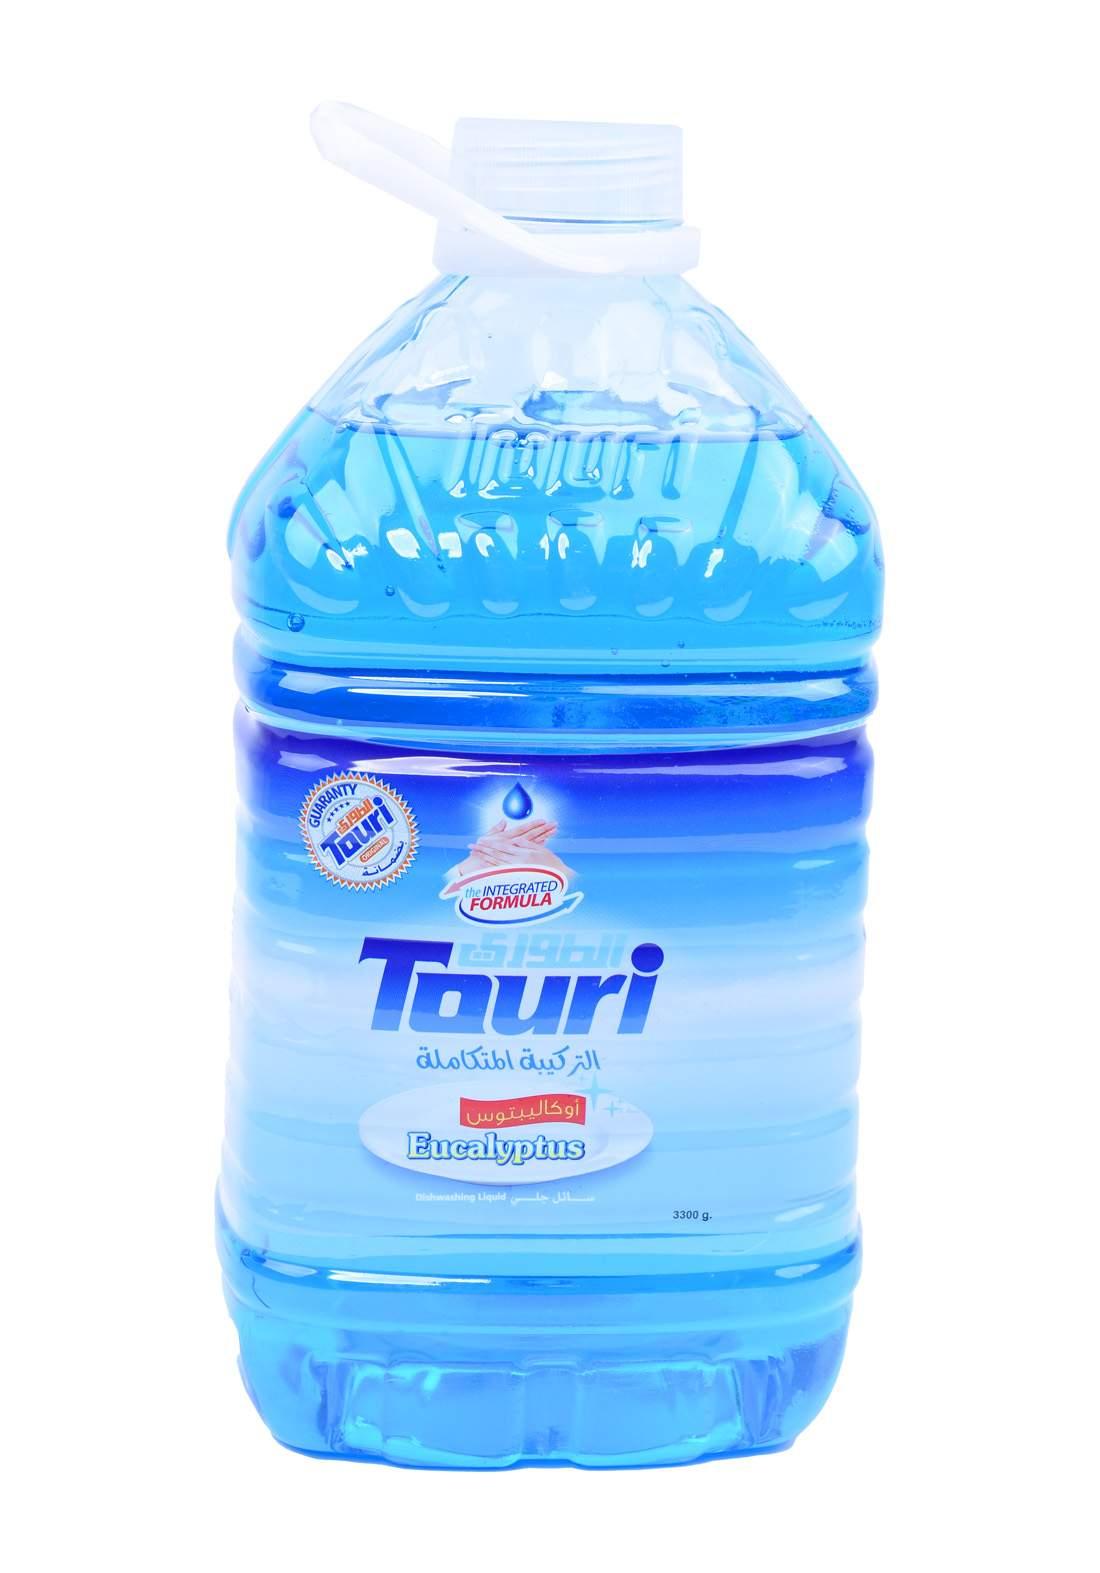 Touri Dishwashing Liquid Eucalyptus 4000 ml سائل غسيل الصحون برائحة الاوكالبتوز